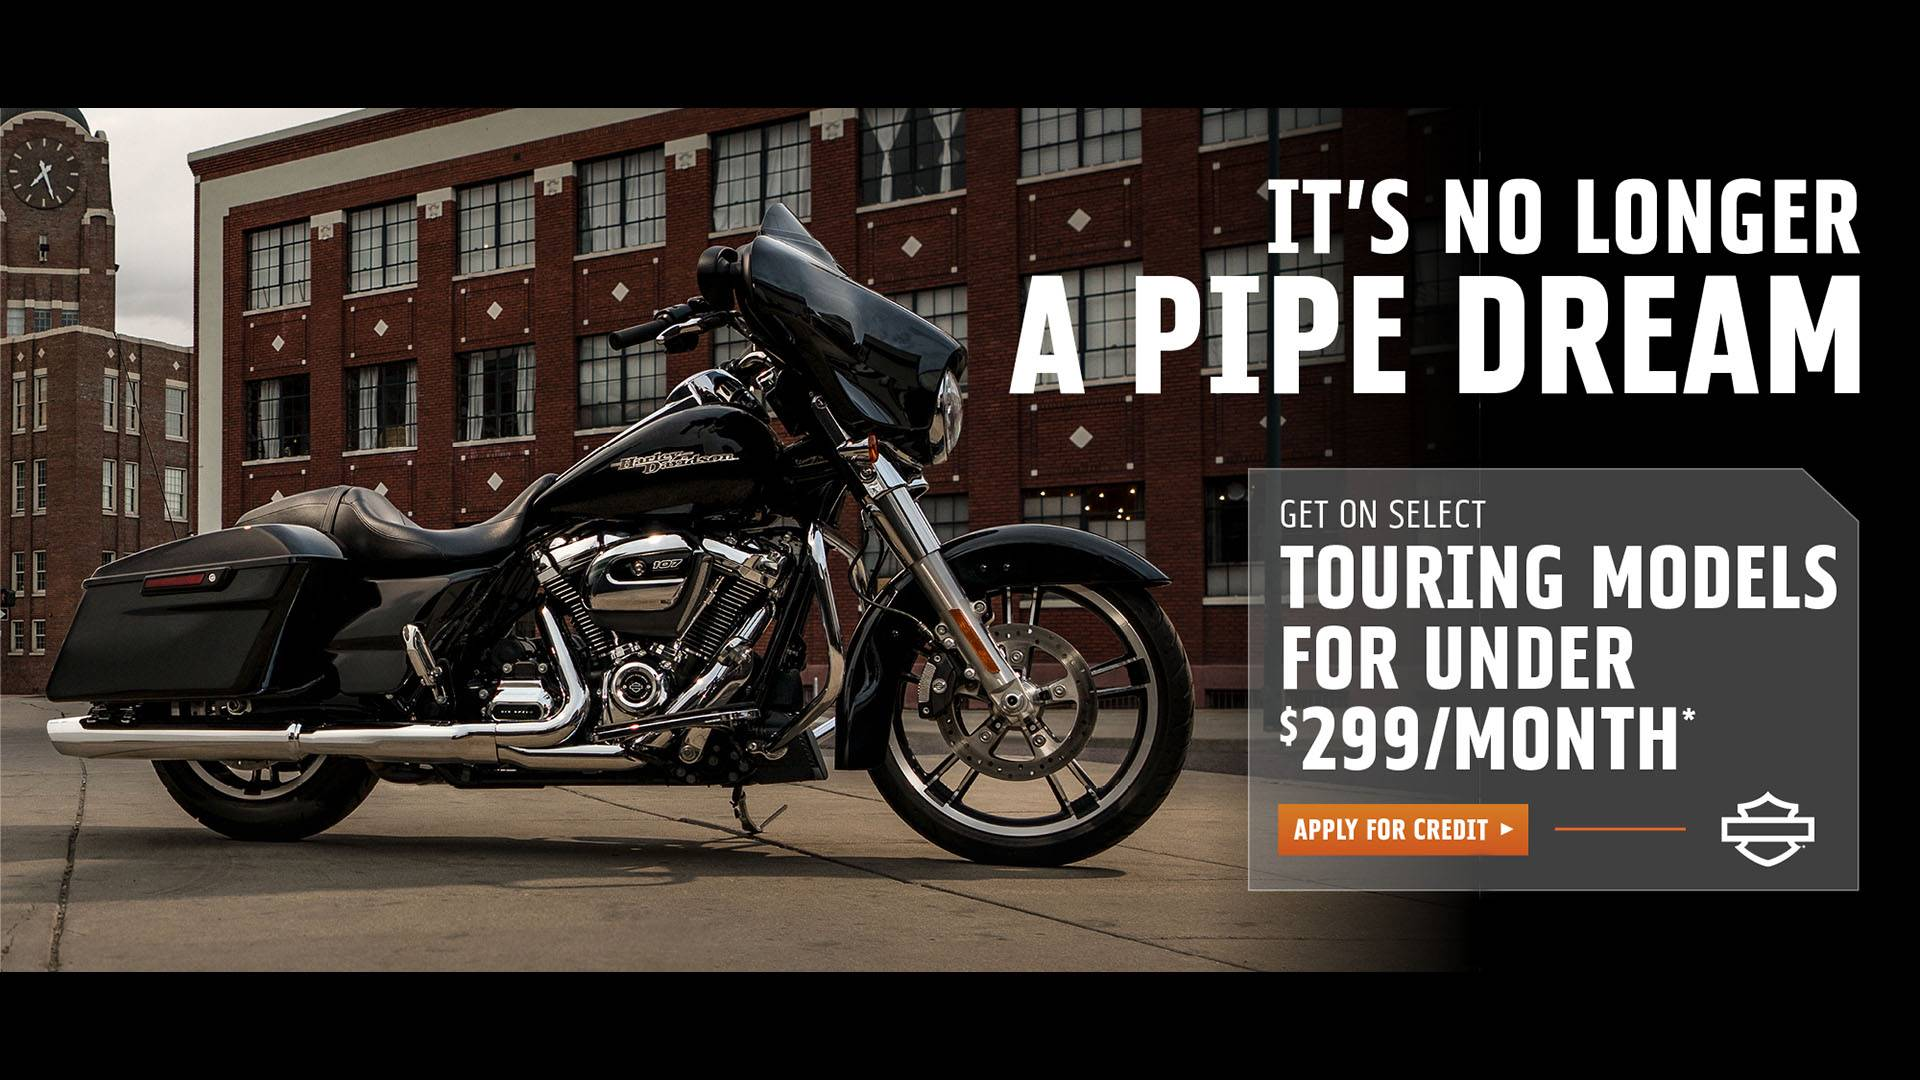 Orlando Harley-Davidson | 3 Dealerships! Historic Factory, East & South